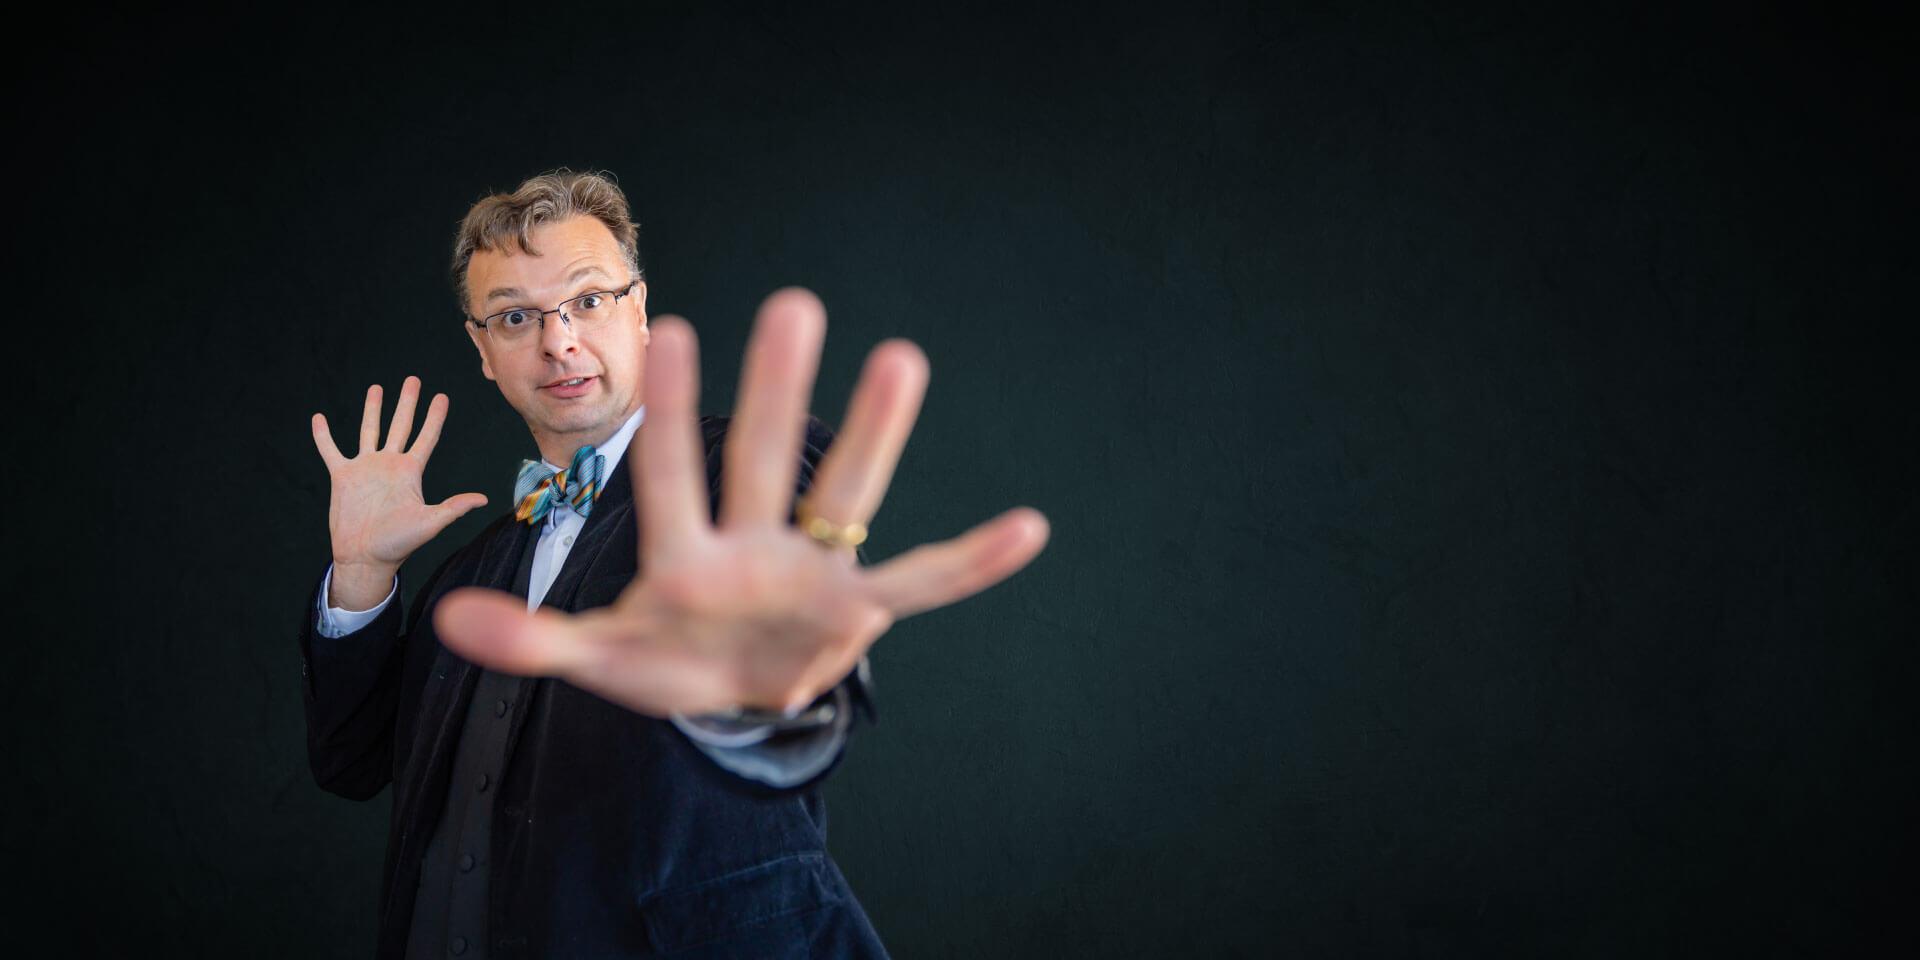 Matt Disero shows hand empty